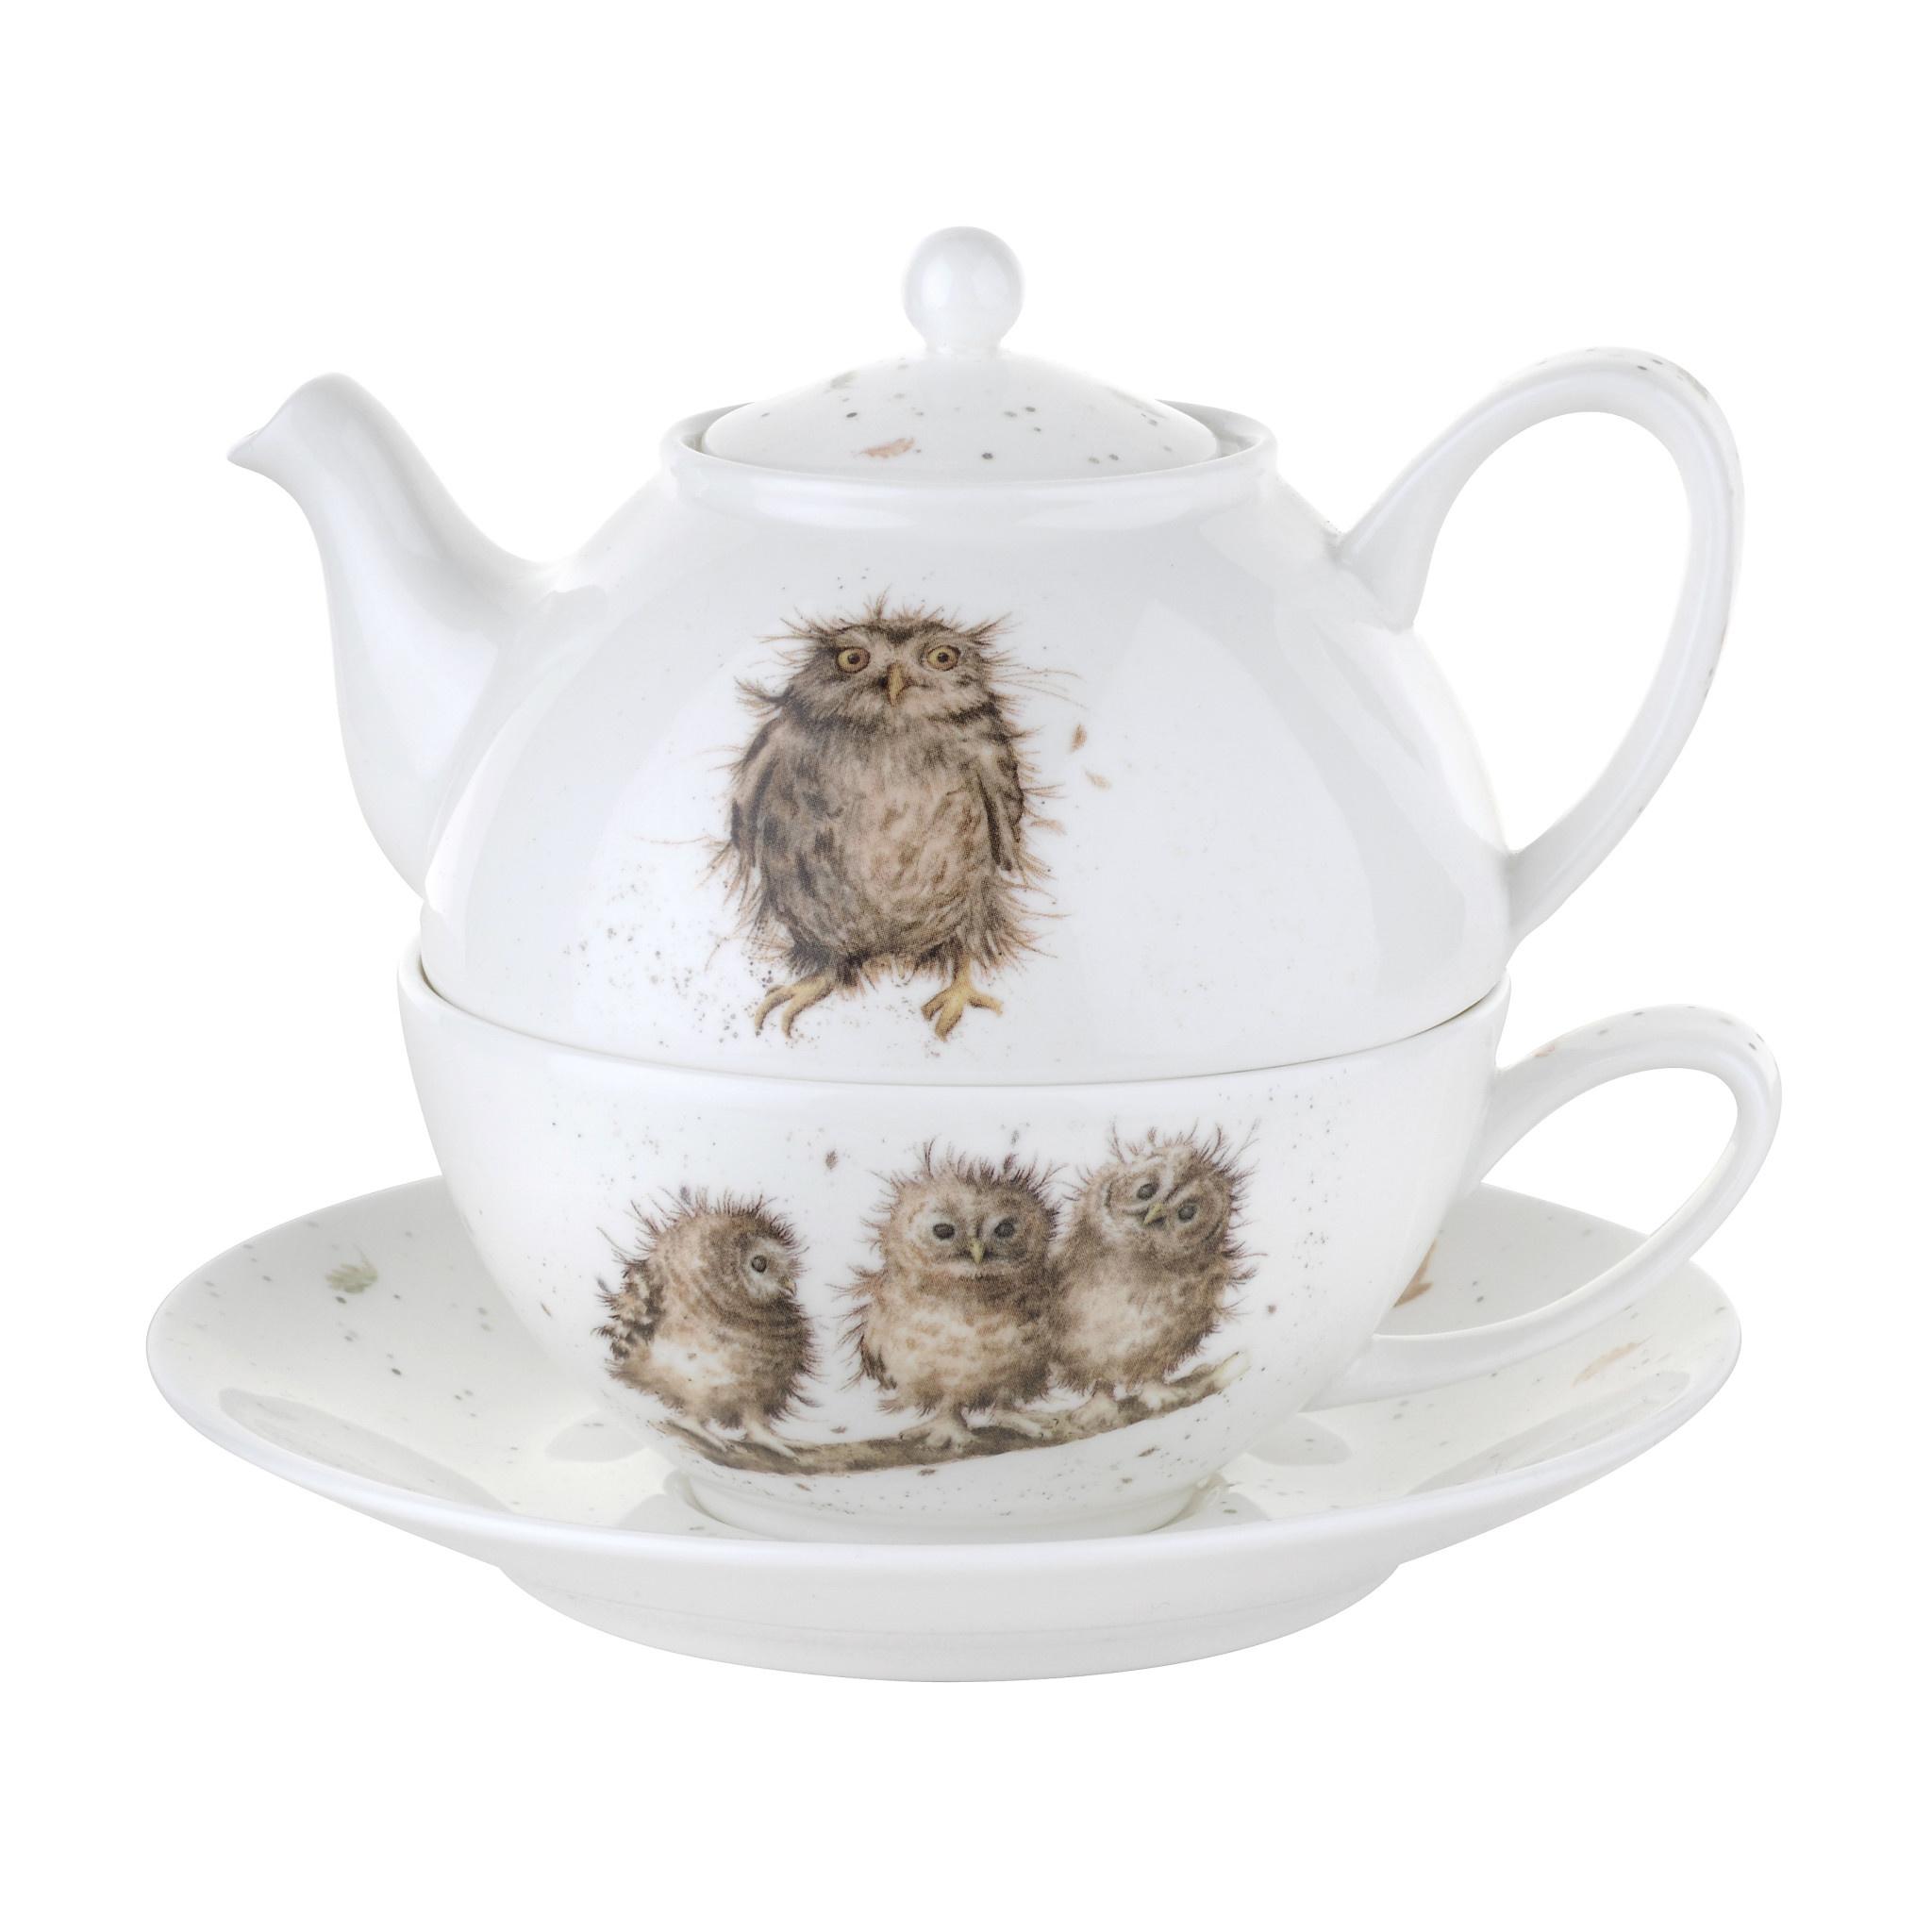 Wrendale Designs 'Tea For One' Set